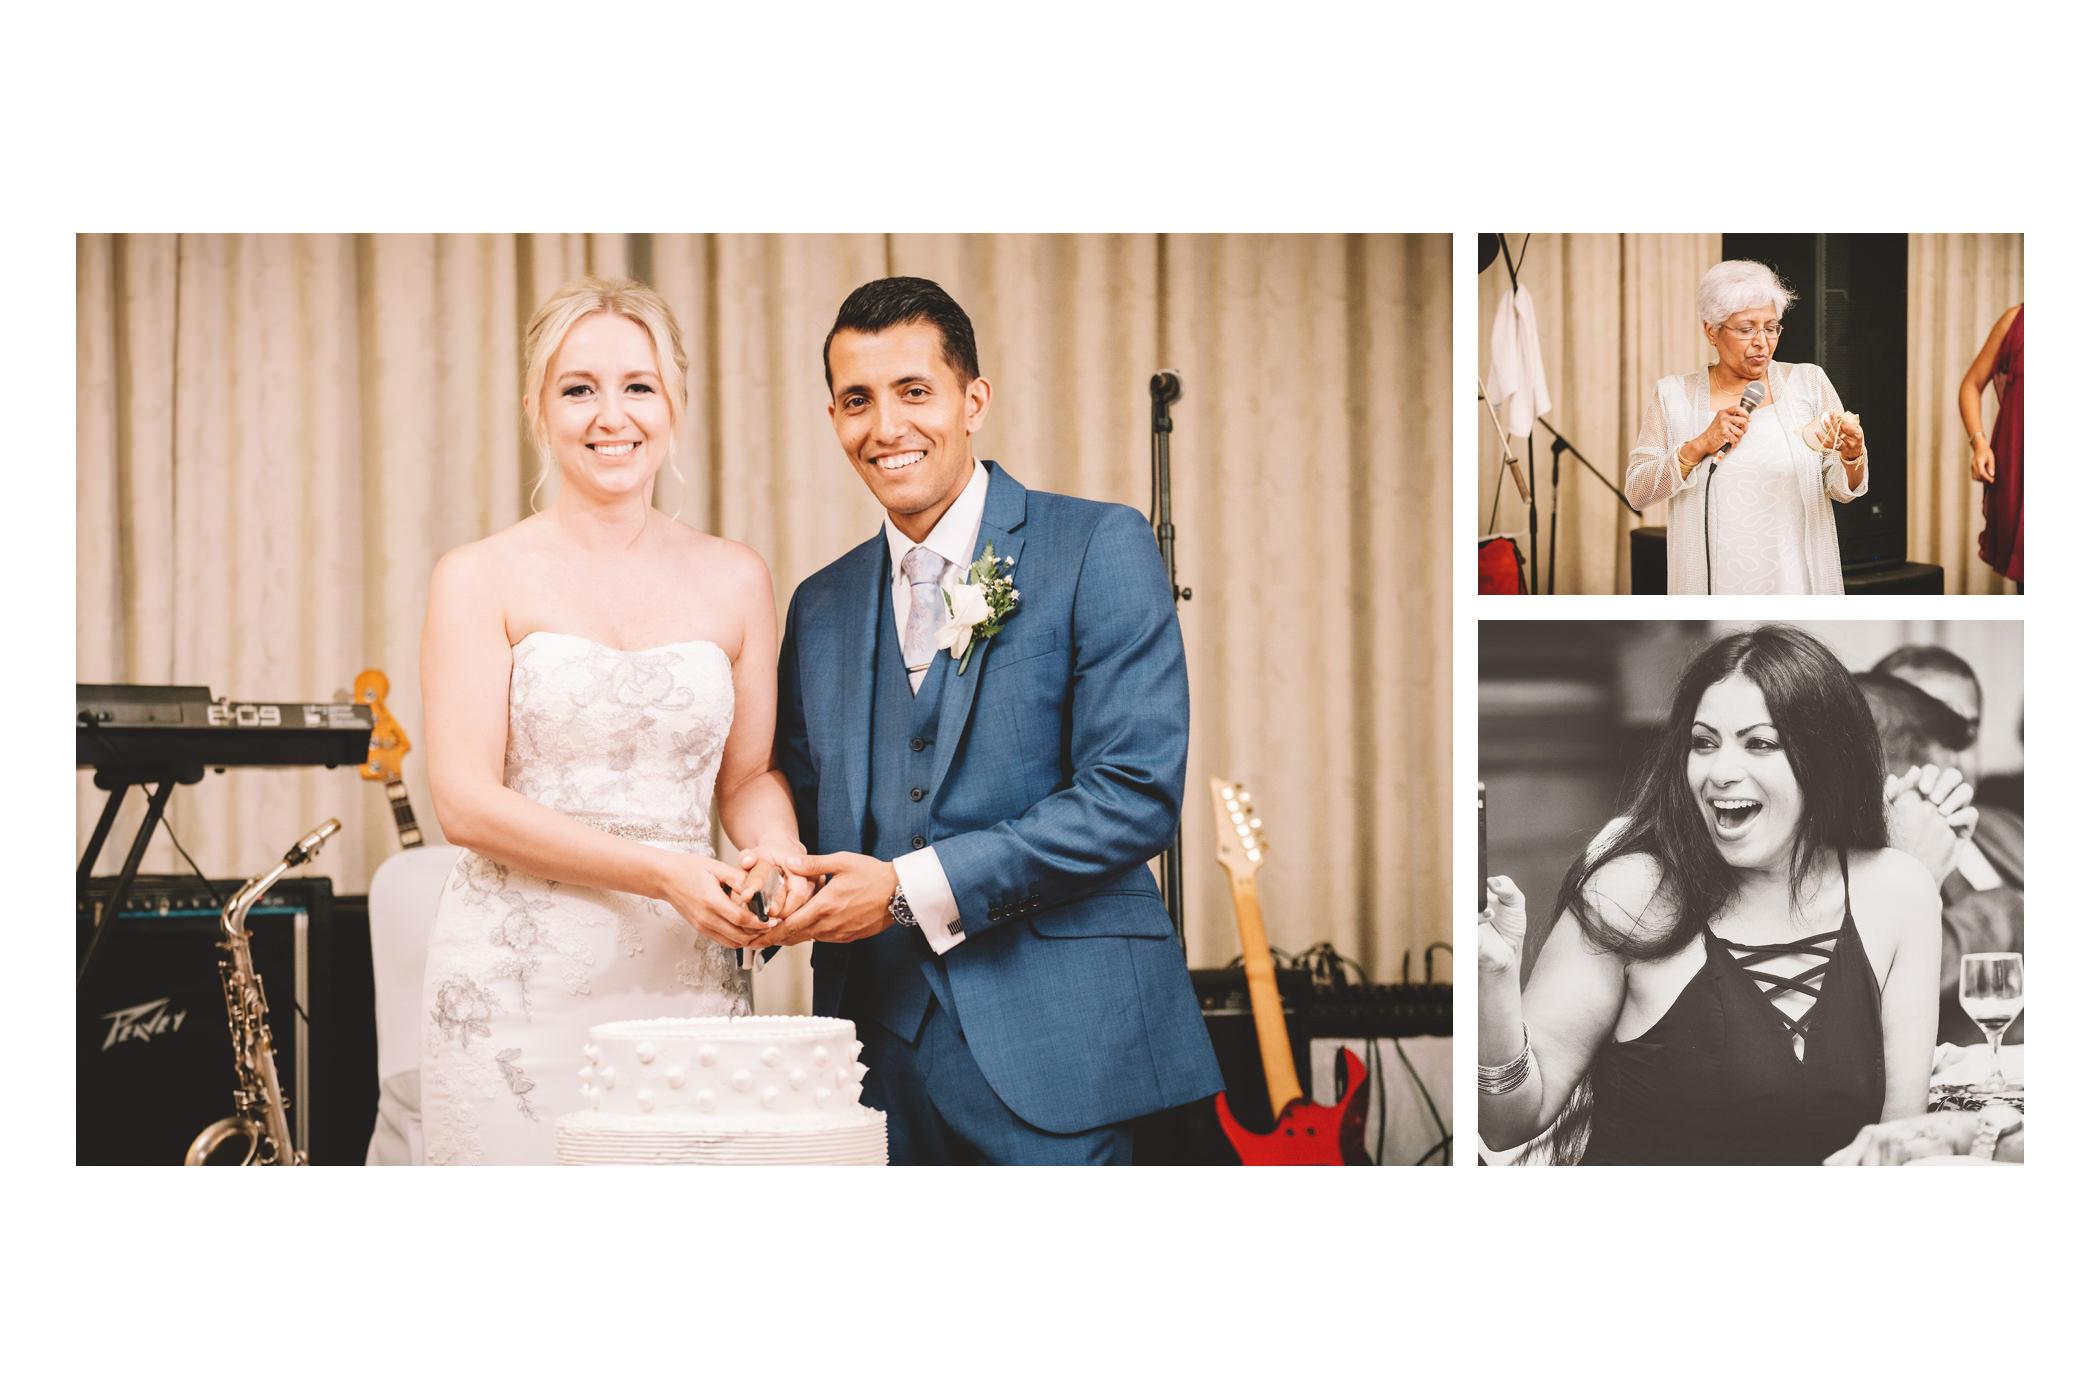 Bluff Wedding Photography Bride and Groom El Arish